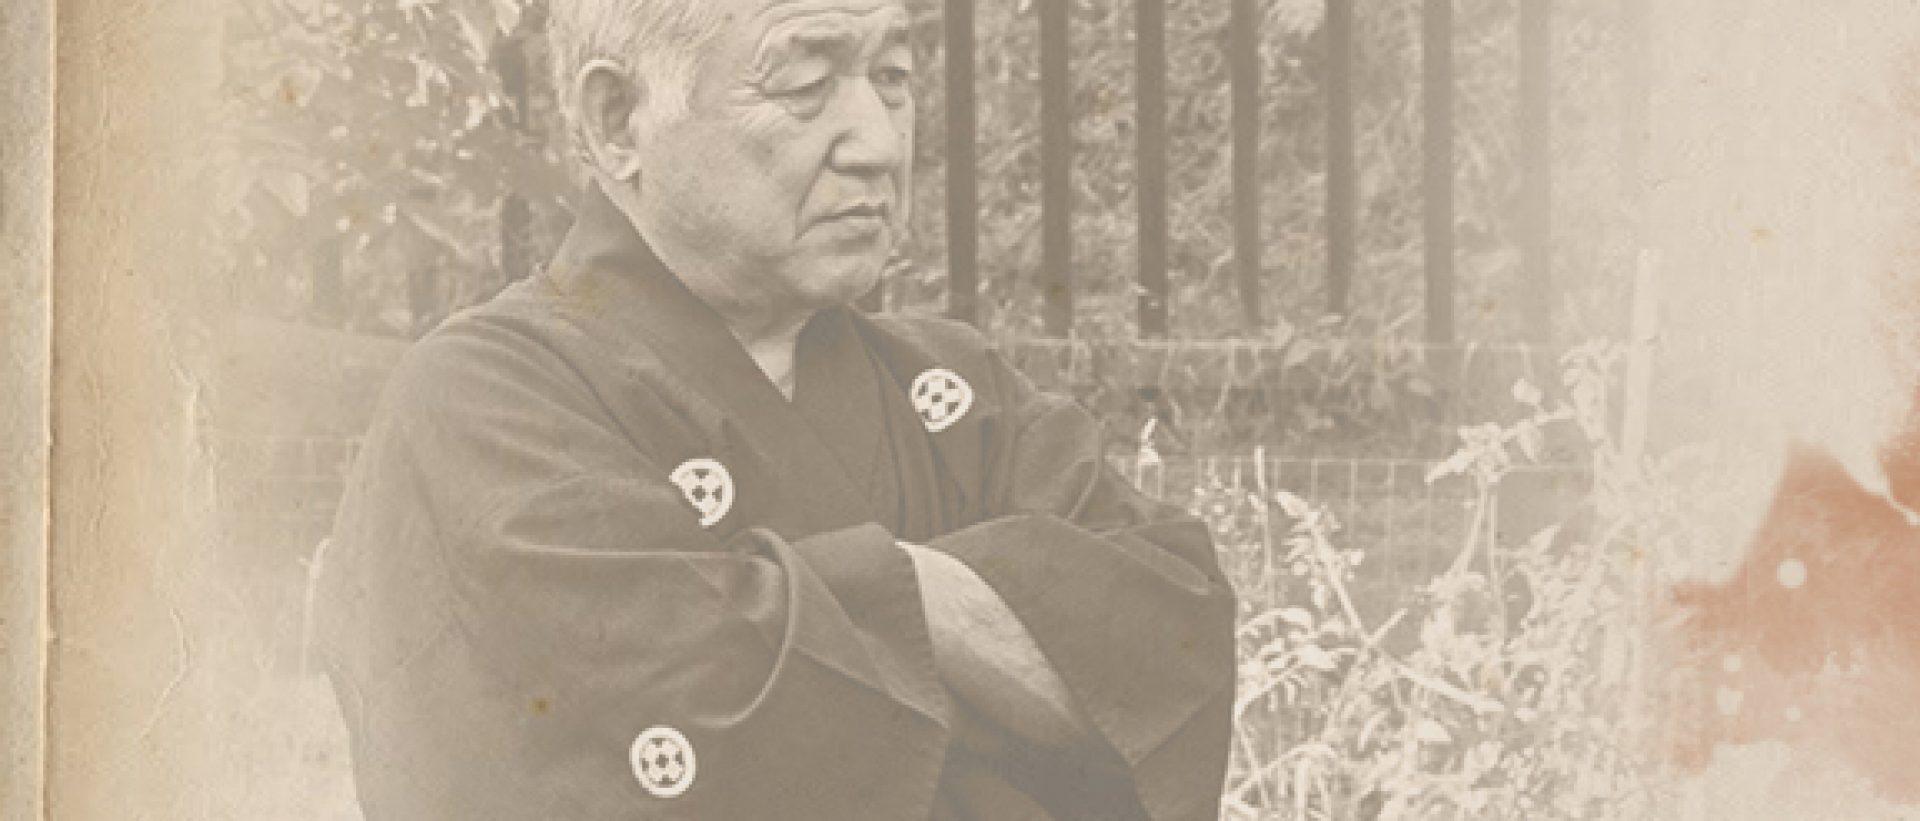 Nakagawa Ryū Battōjutsu 中川流抜刀術